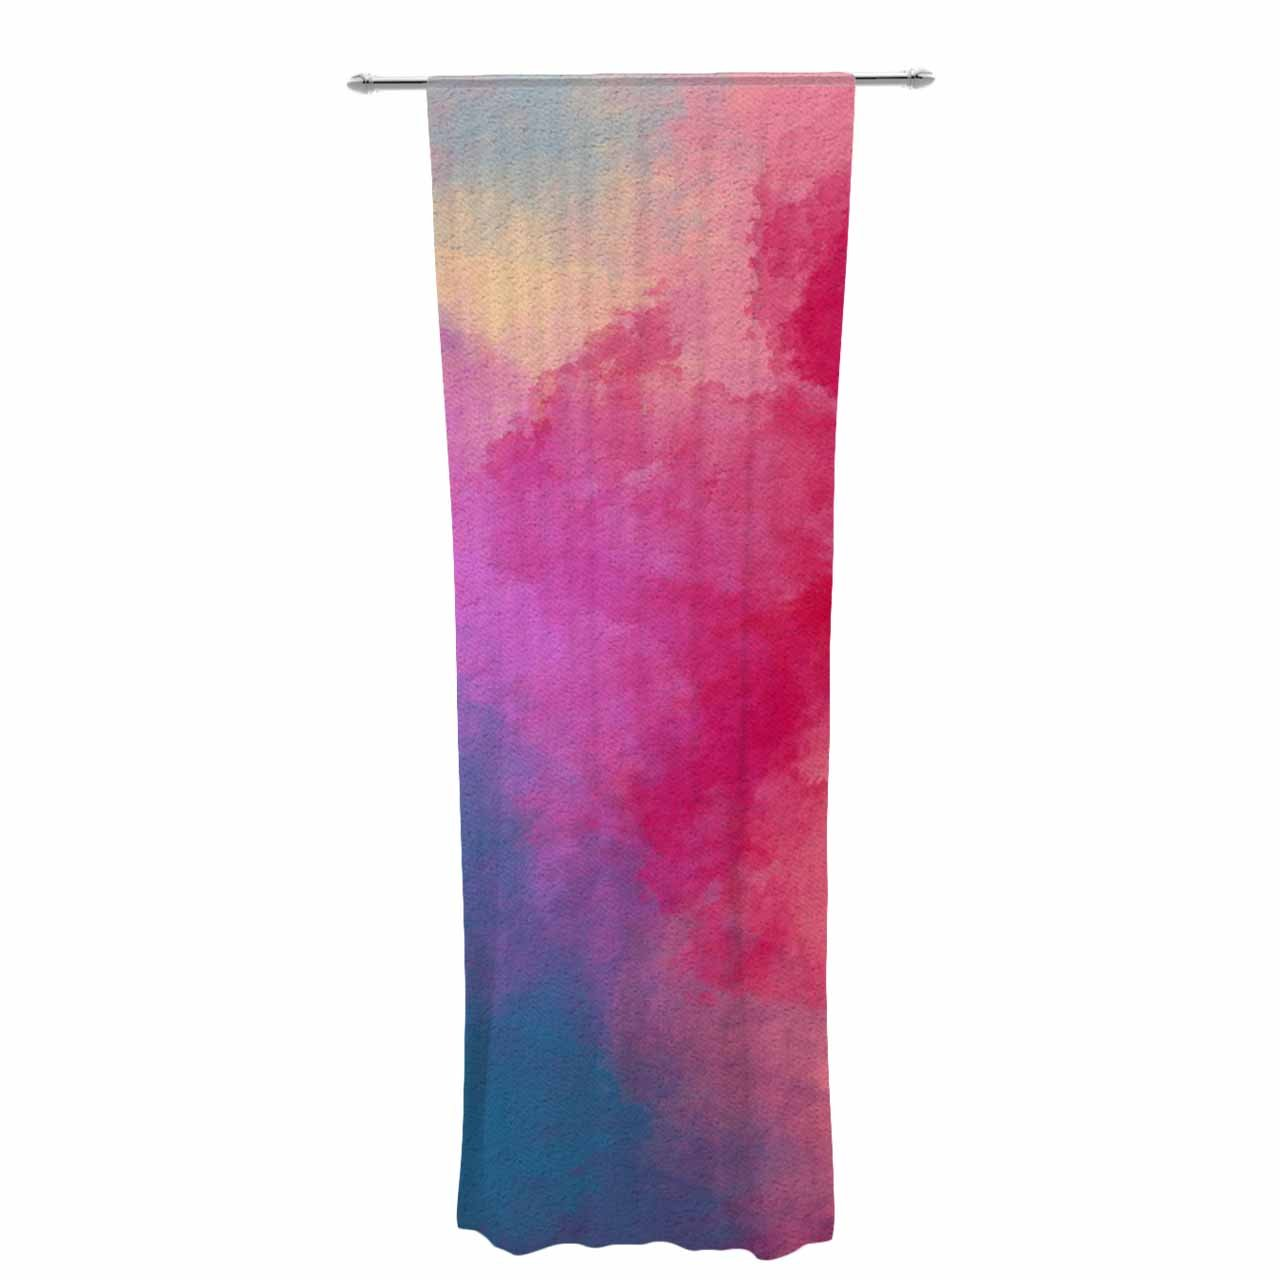 Kess InHouse Viviana Gonzalez Abstract 01' Pink Blue Decorative Set, 30' x 84' Sheer Curtains